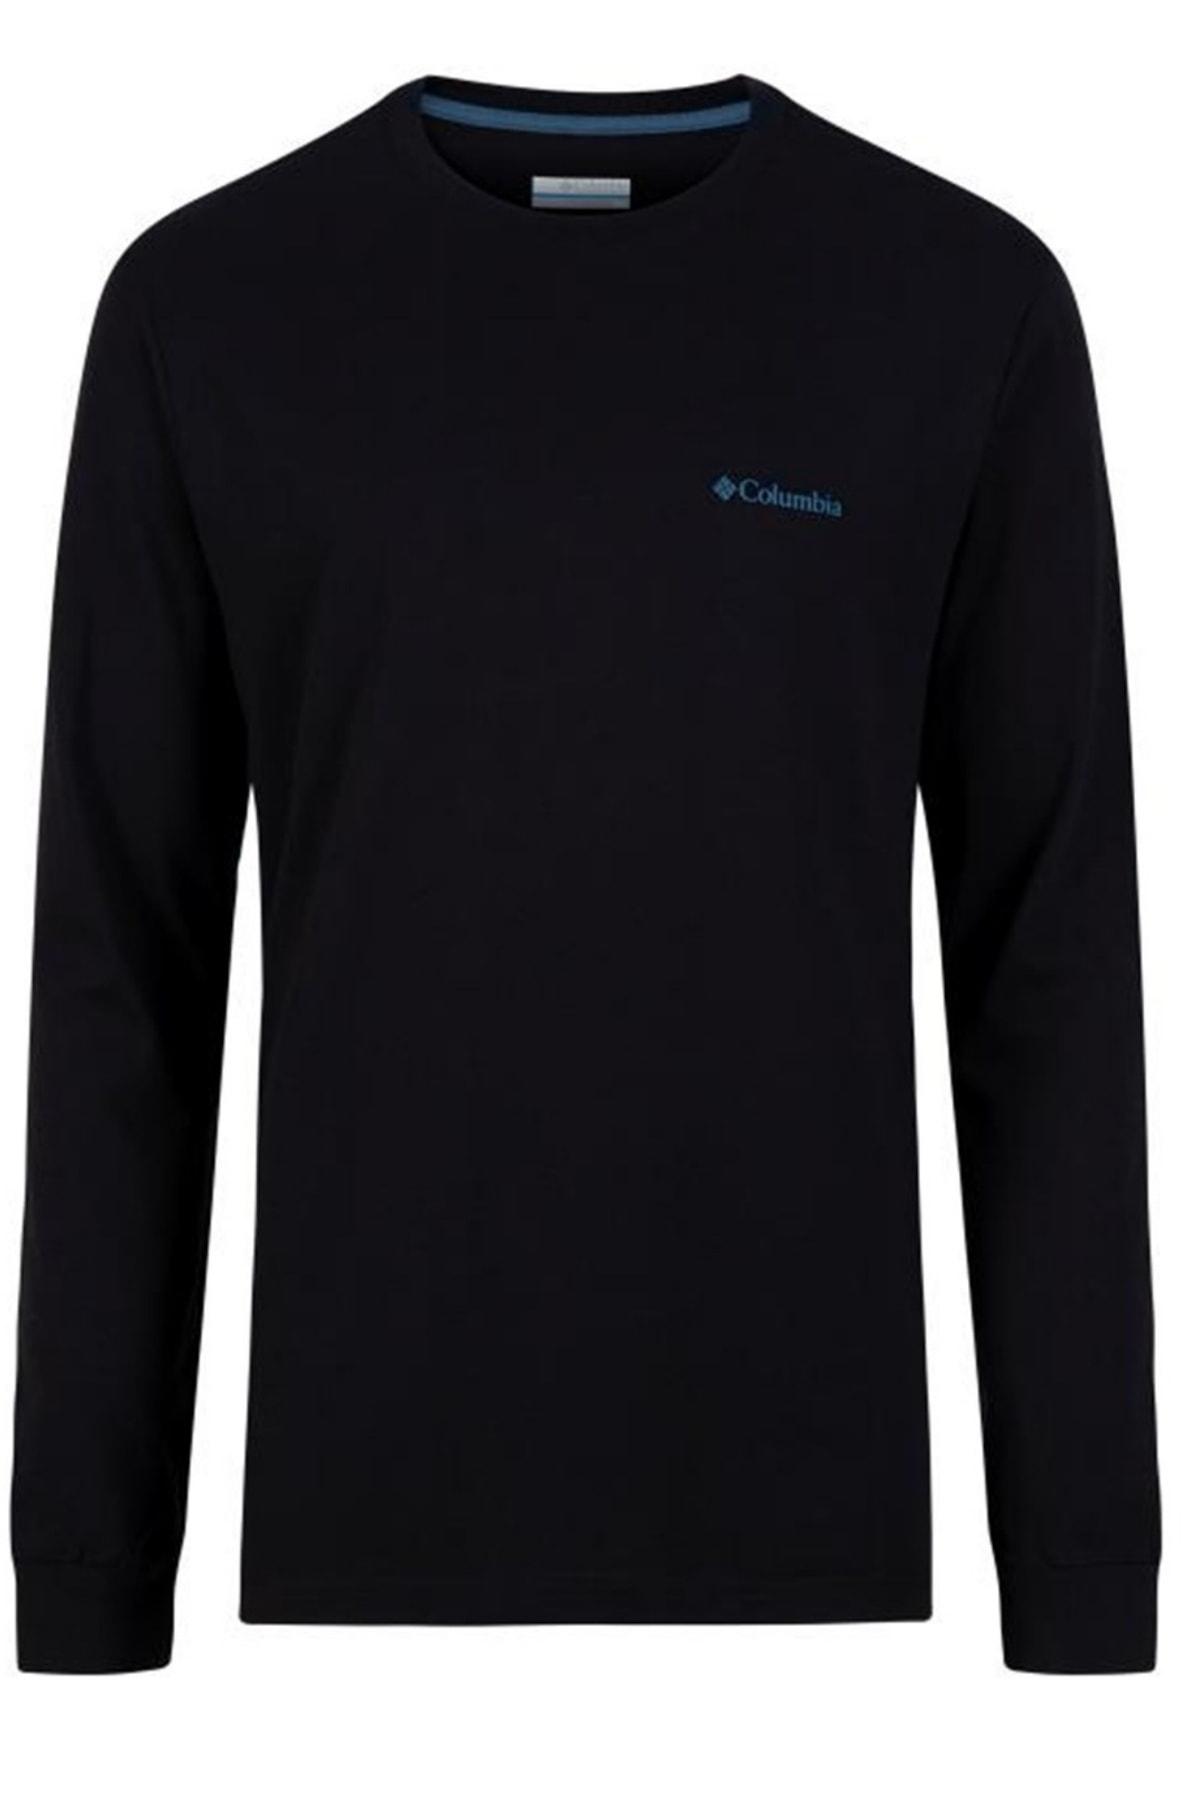 Columbia Cs0175 Csc Basic Erkek Sweatshirt 9110060010 1